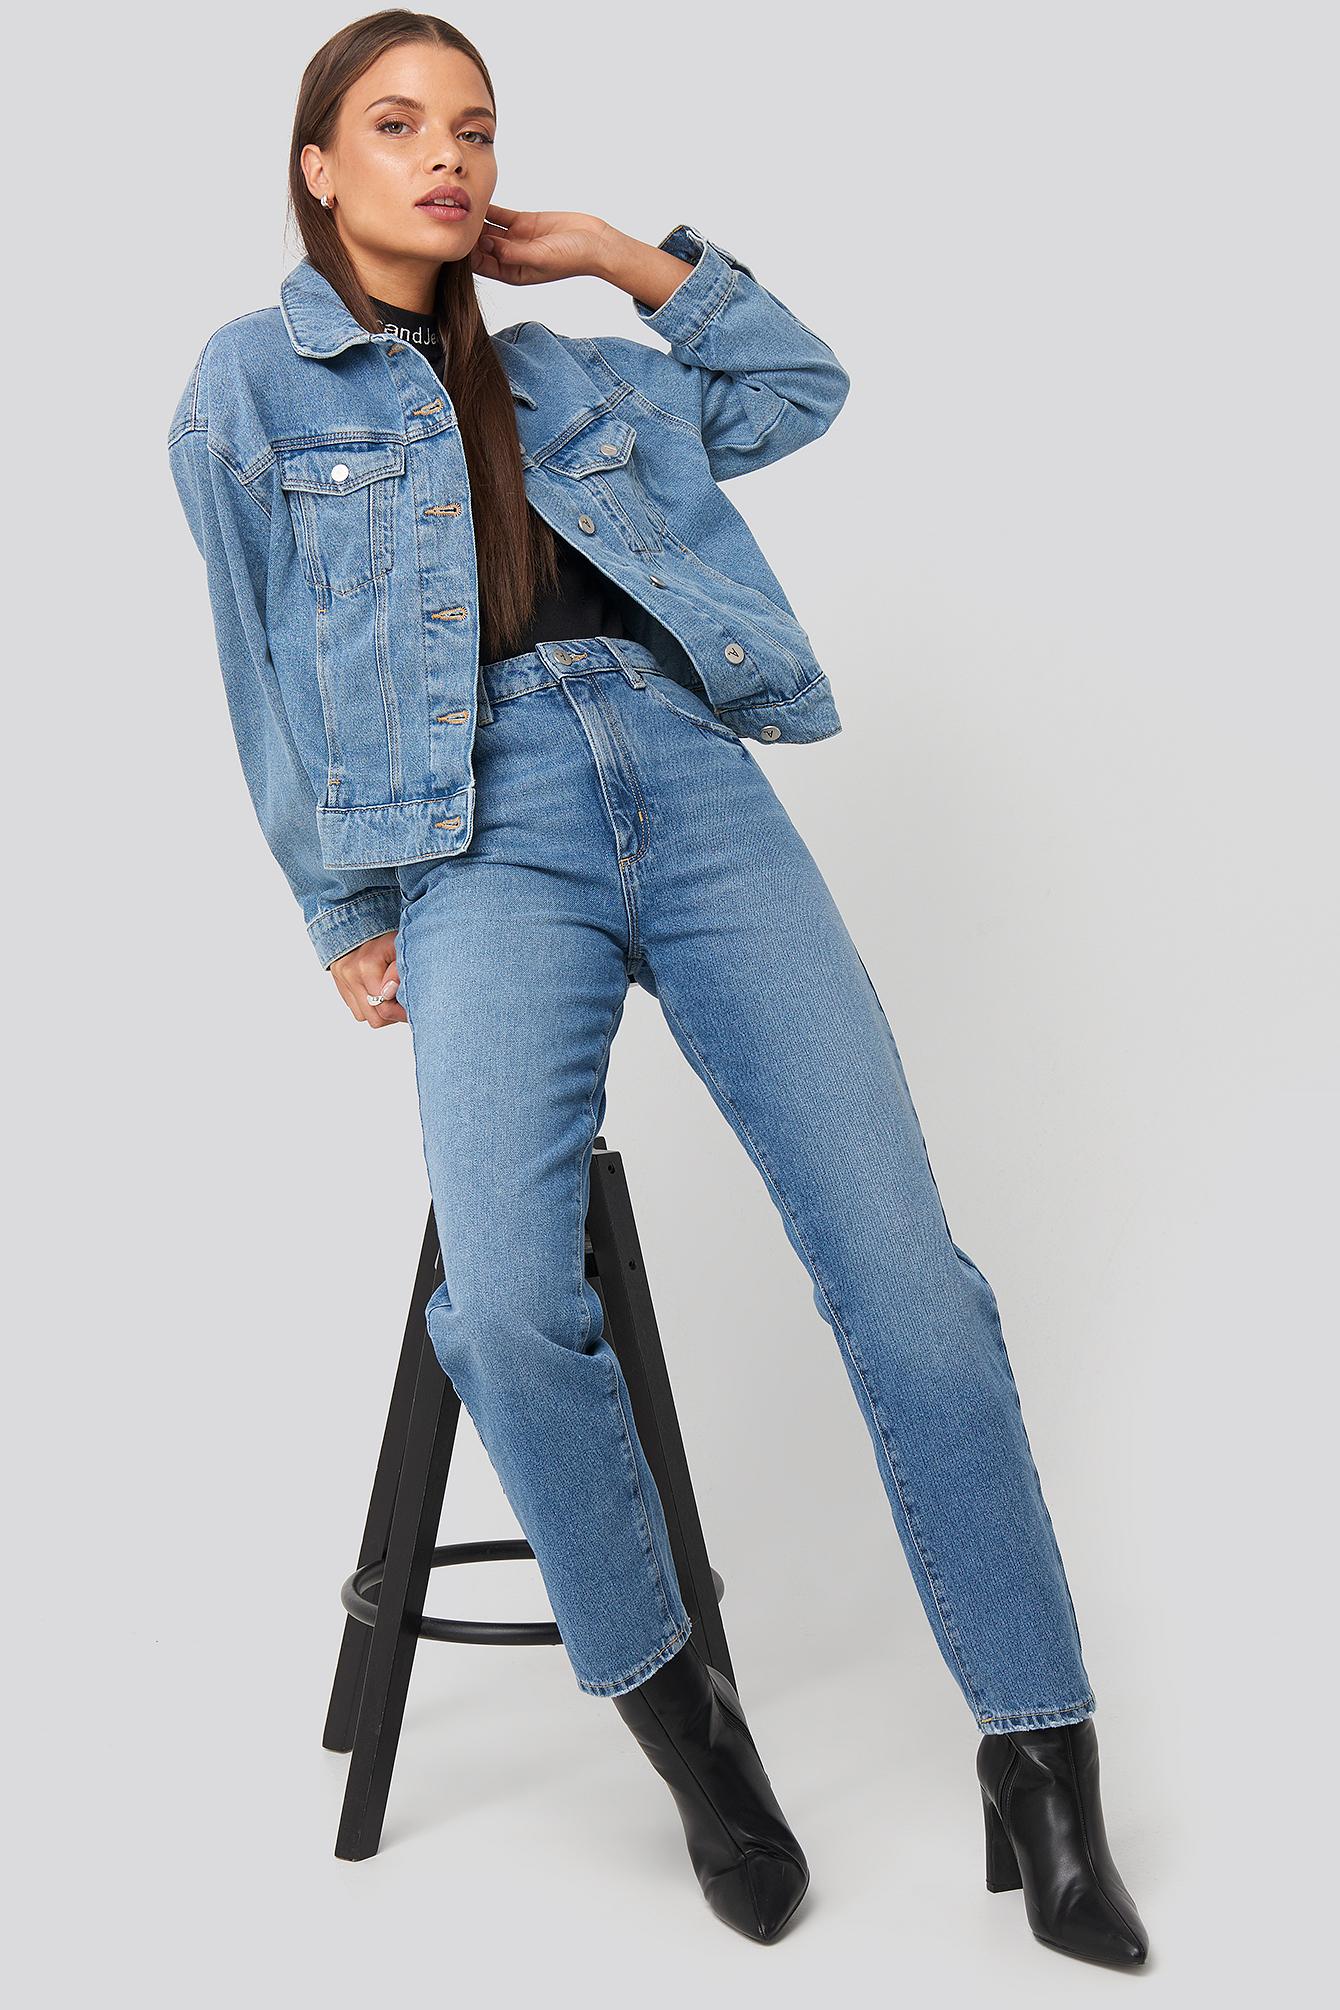 abrand -  A 94 High Slim Jeans - Blue